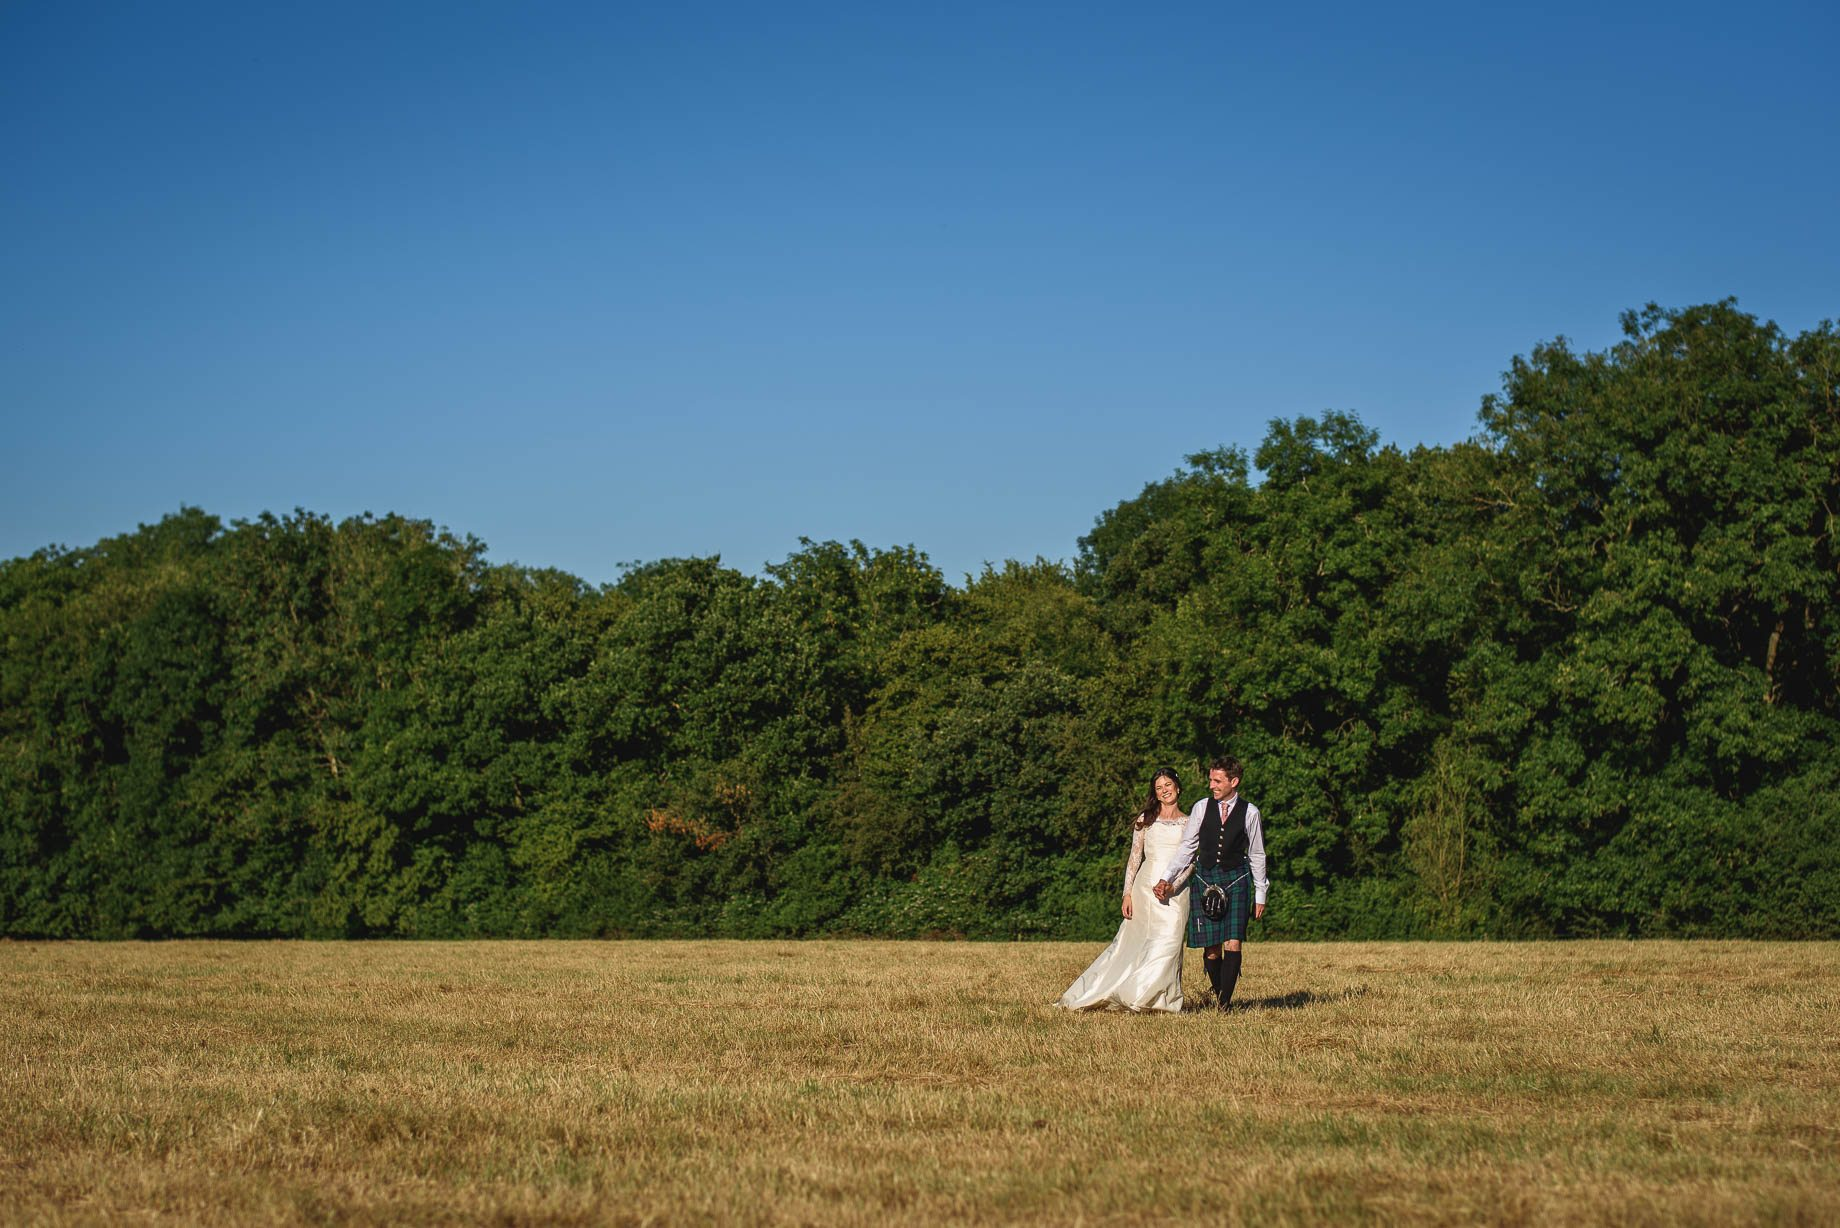 Gildings Barn wedding photography - Sarah and Steve (151 of 190)